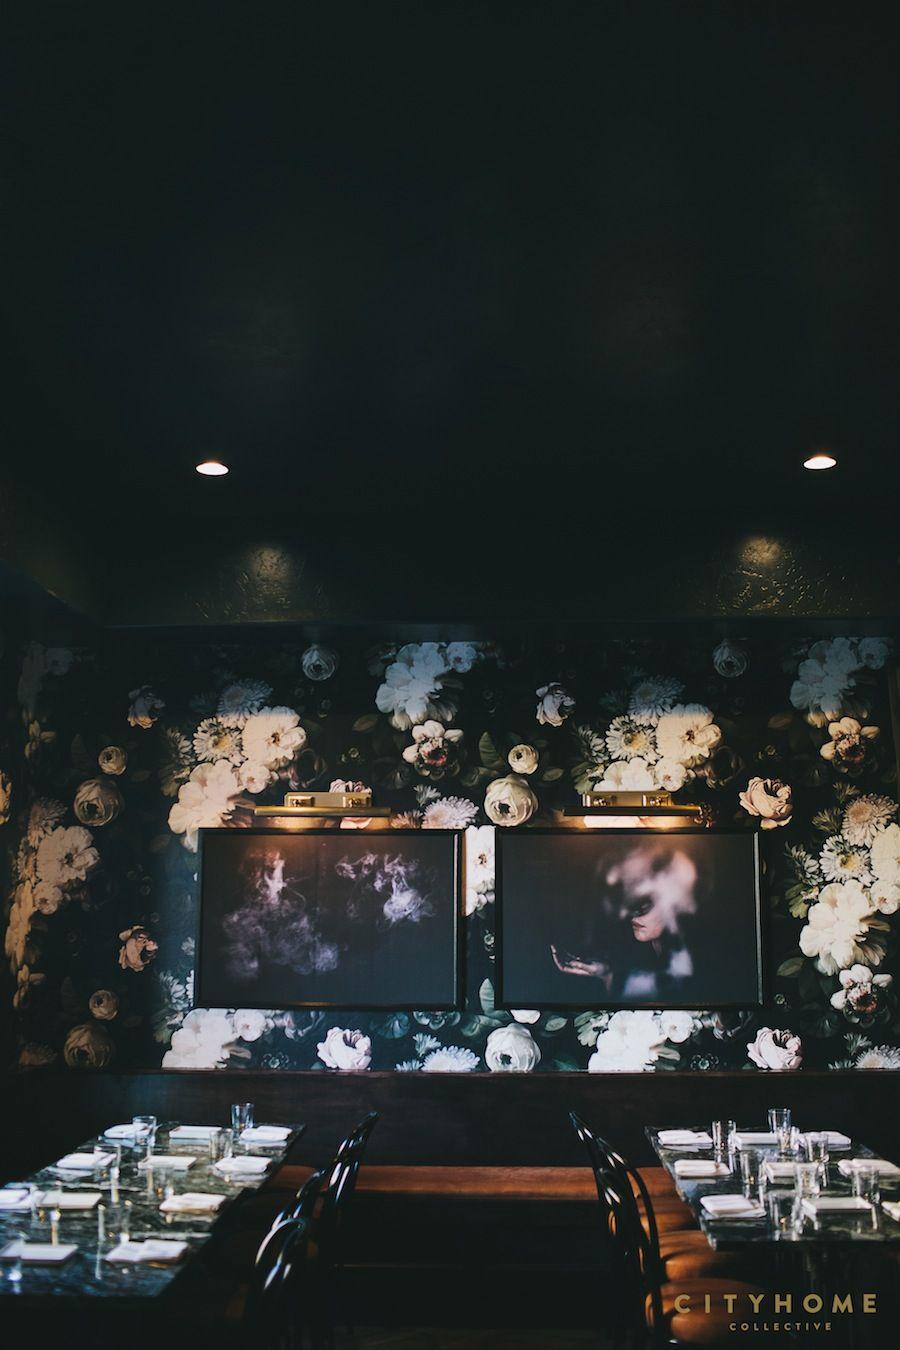 Finca cityhomedesign pinterest wallpaper floral and design